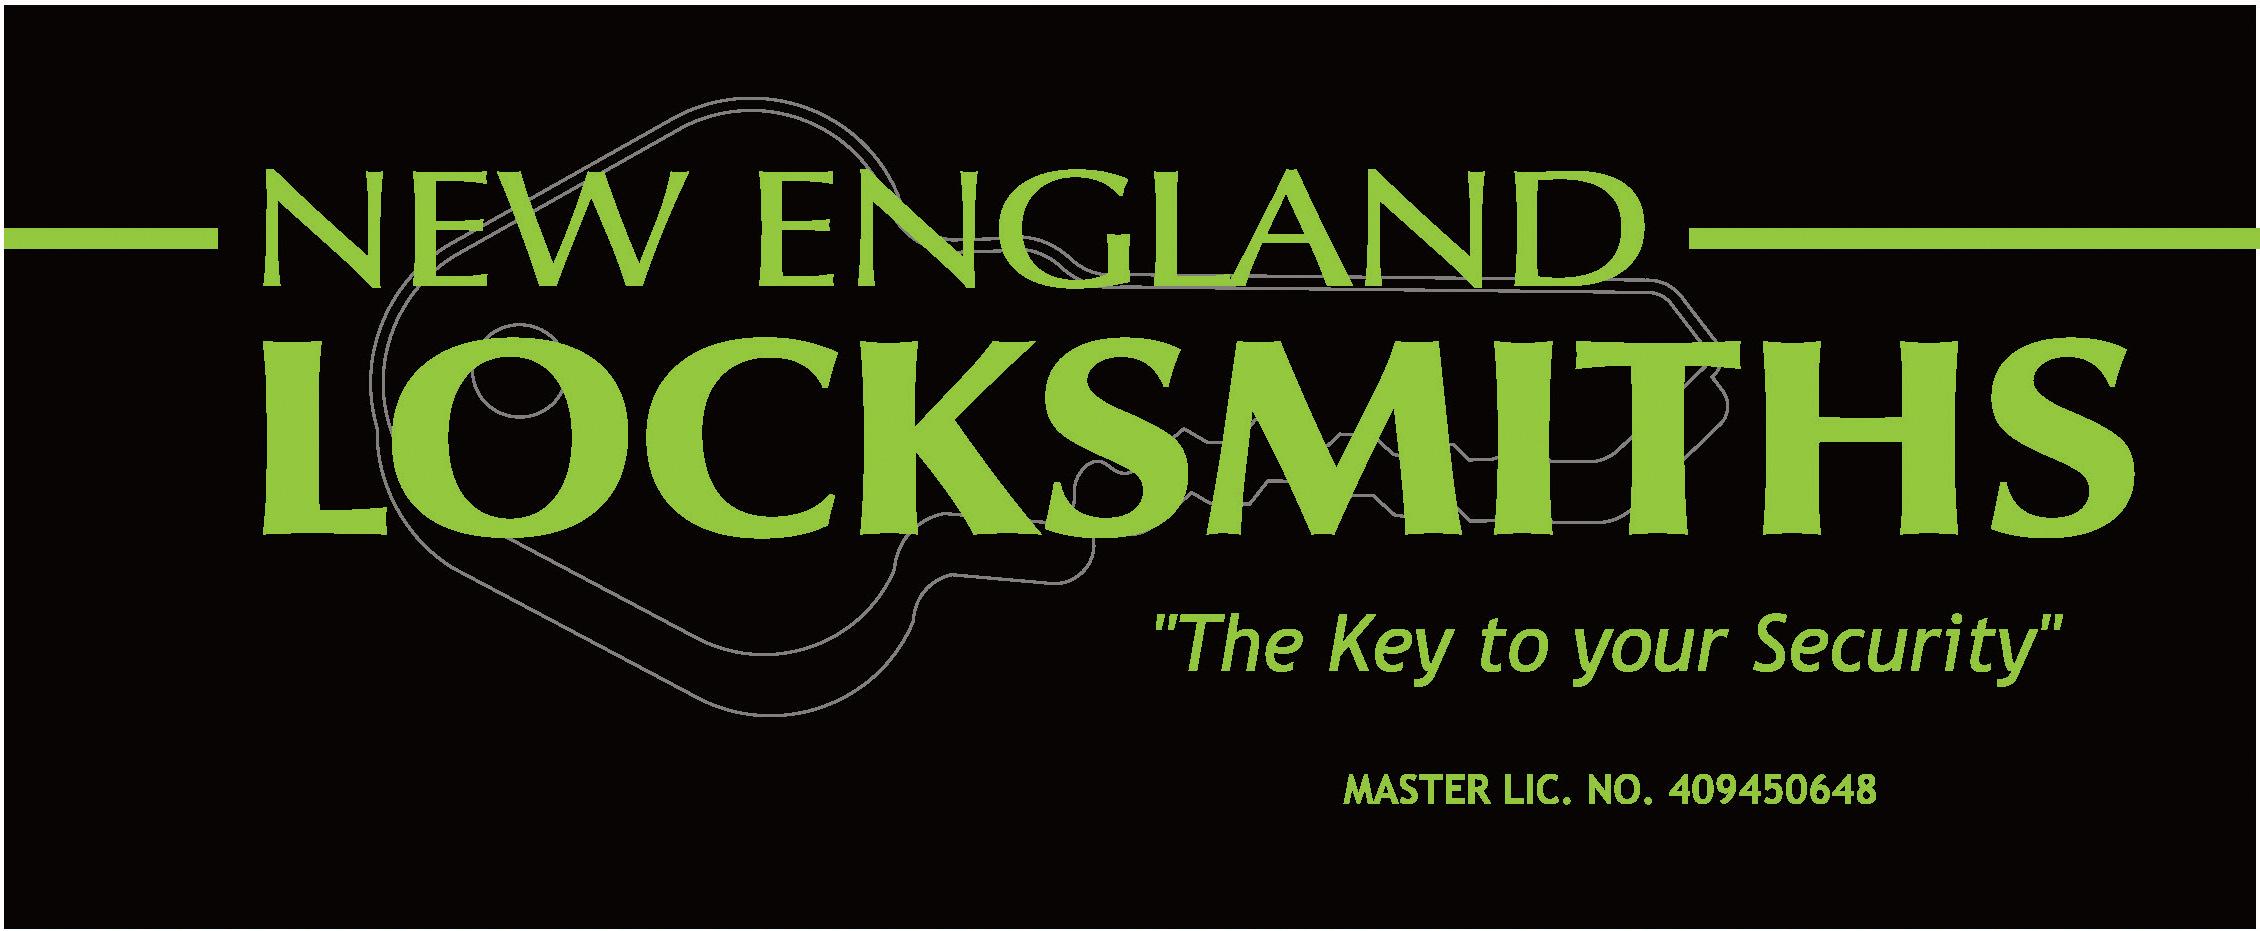 New England Locksmiths  .jpg